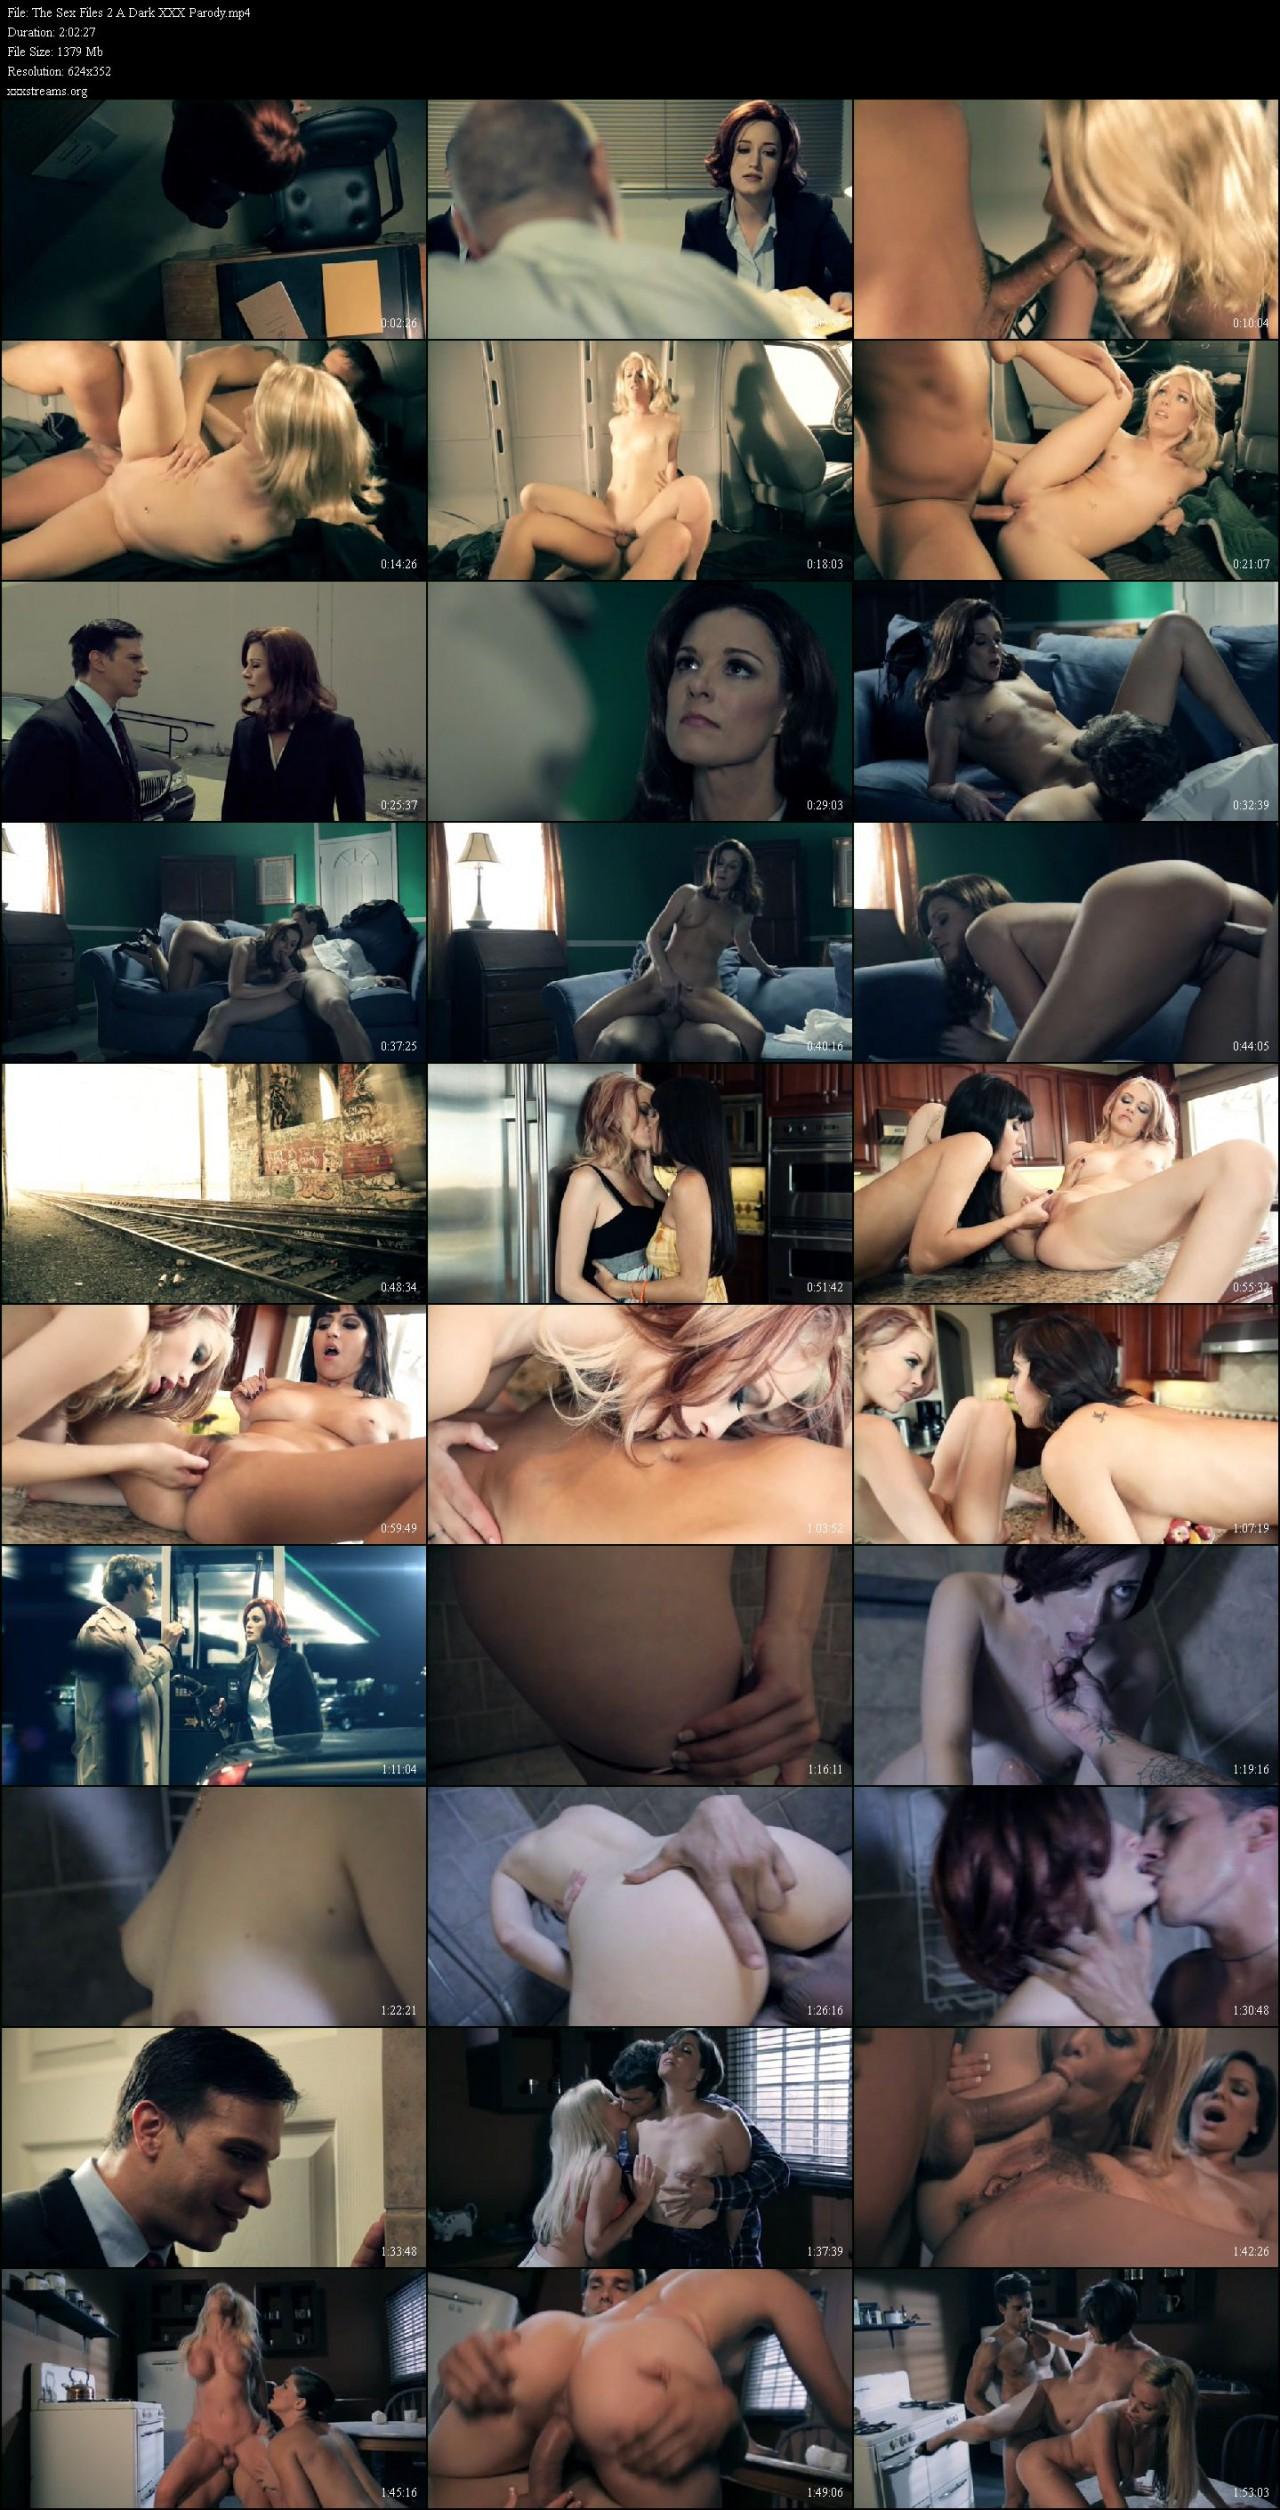 Spanish sex on traxsource